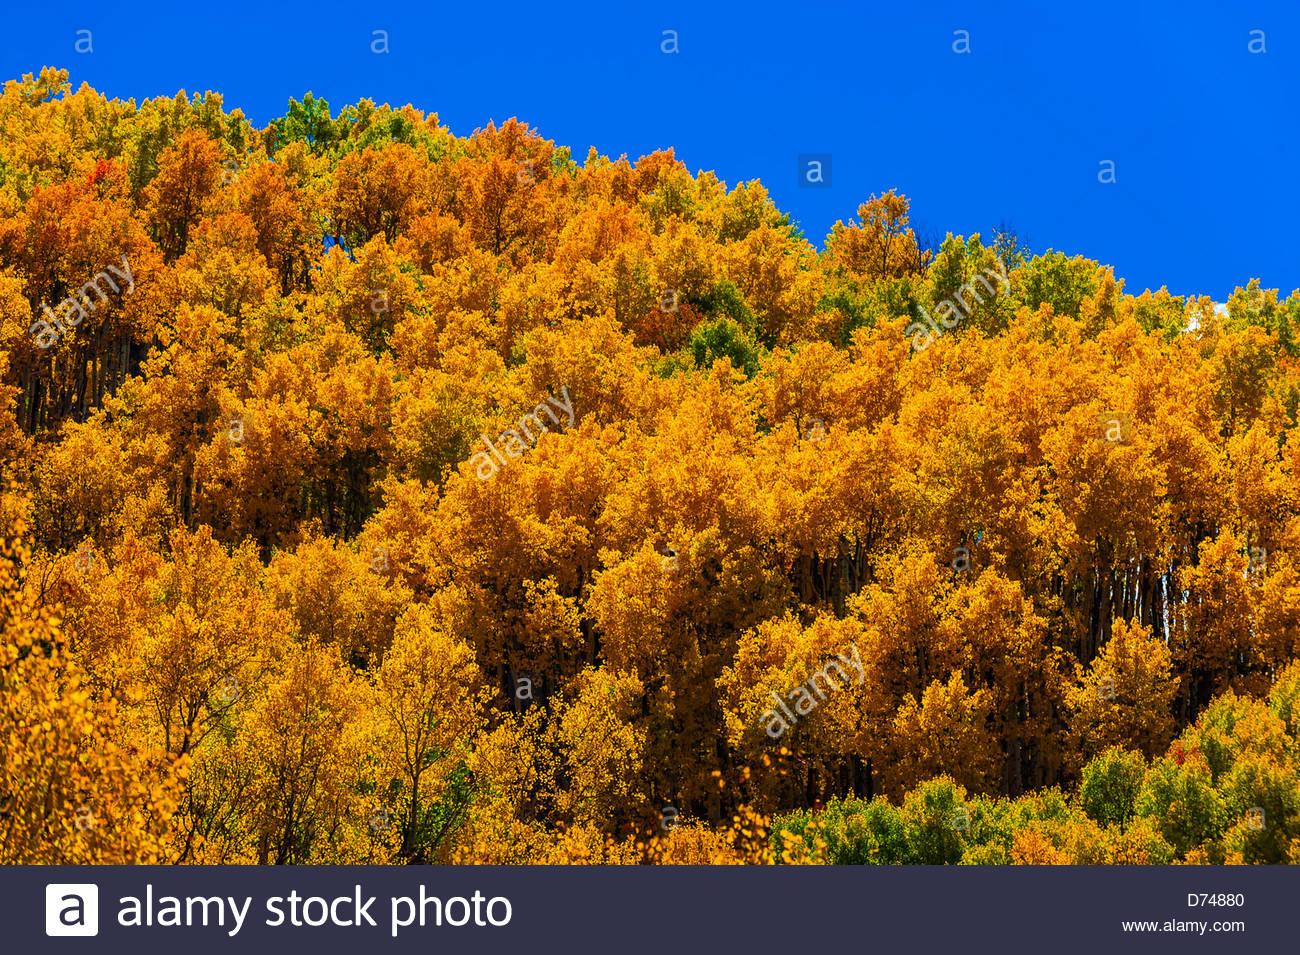 Fall foliage, Rocky Mountains, Redstone, Colorado USA. - Stock Image